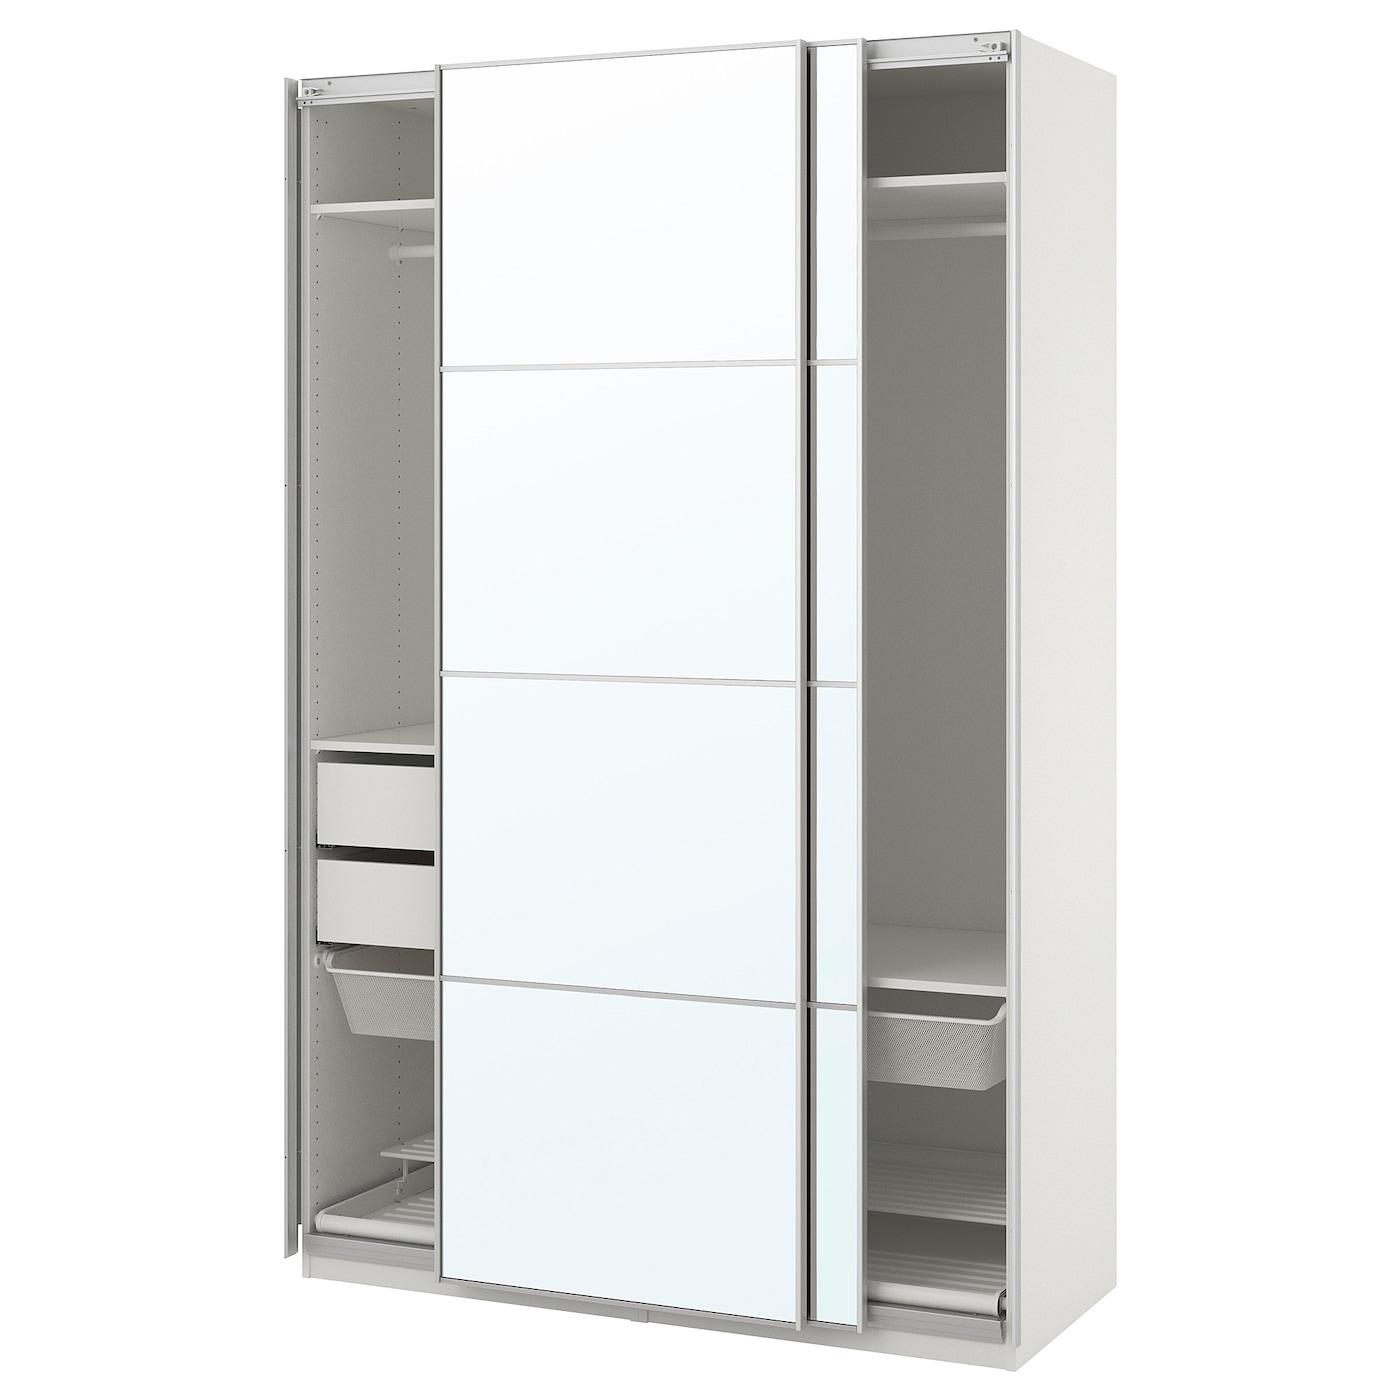 Pax armoire penderie blanc auli miroir 150x66x236 cm ikea - Armoire penderie miroir ...